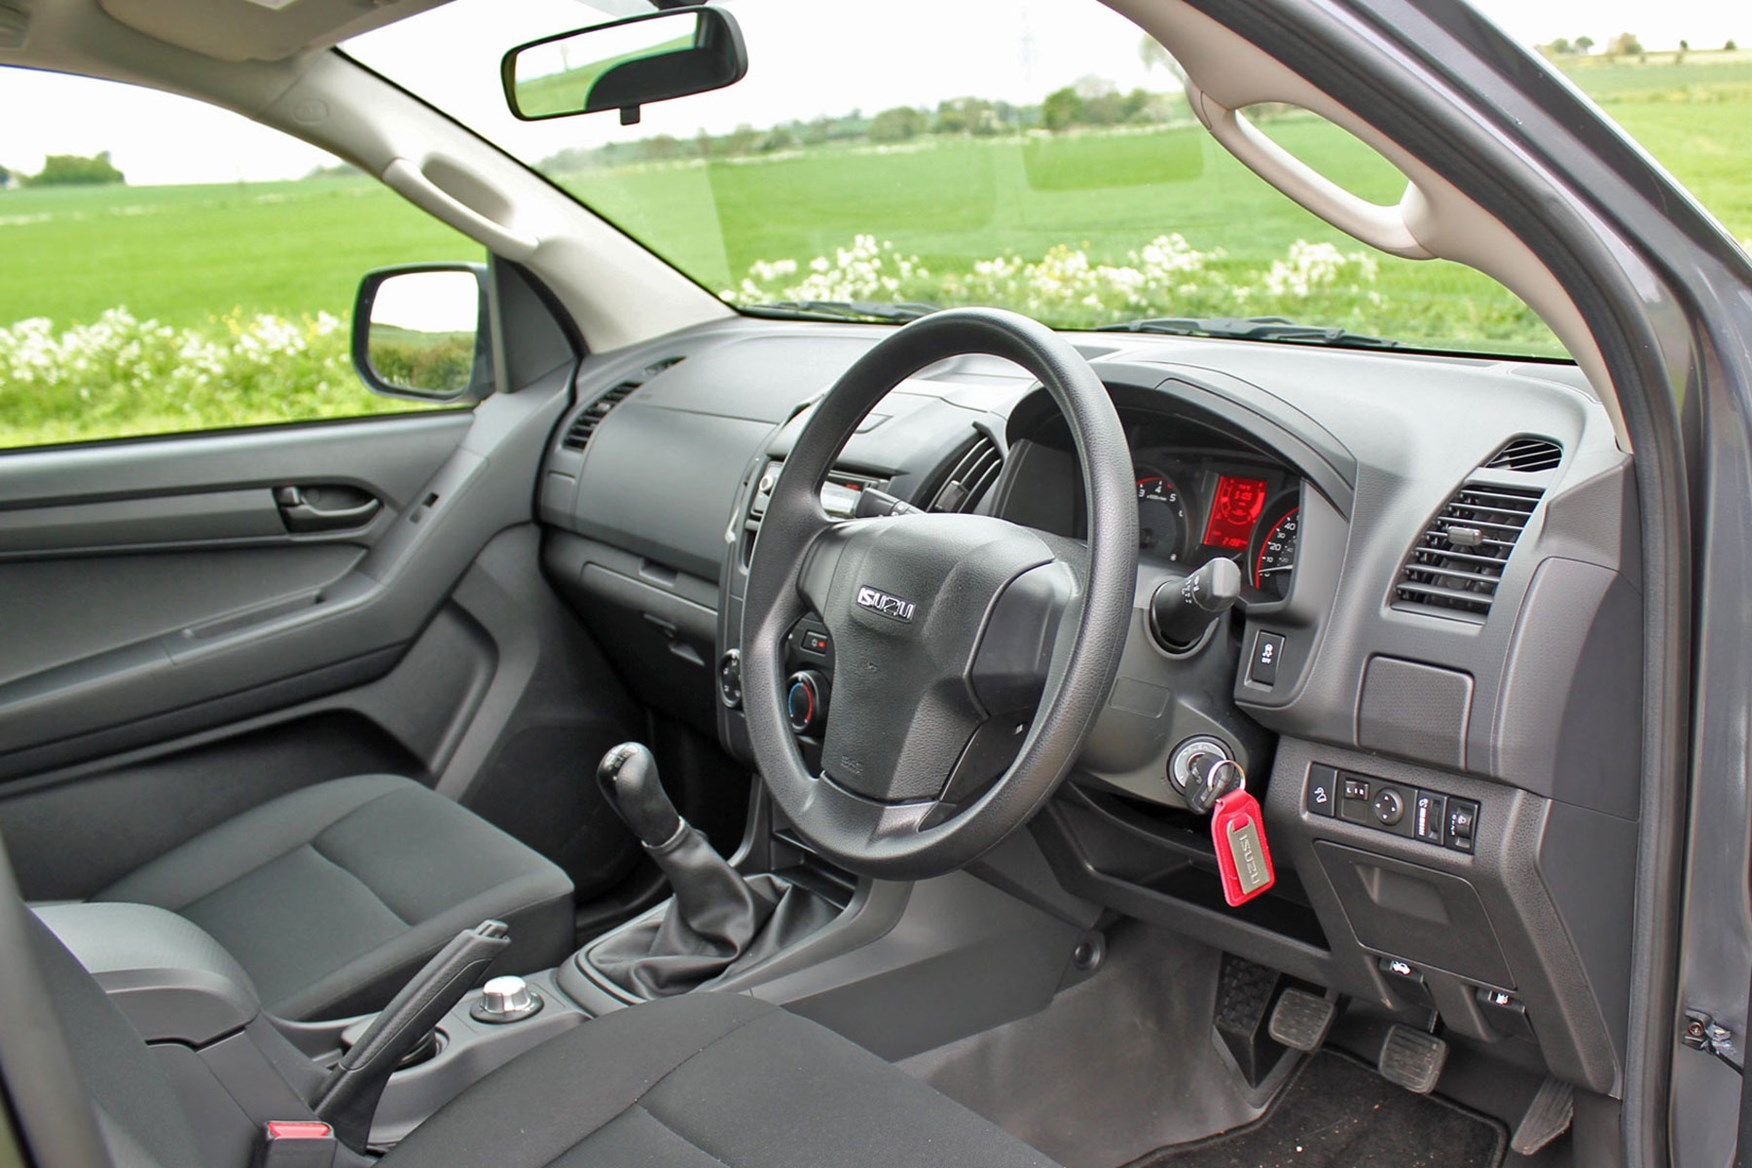 Isuzu D-Max Utility 1.9 review - cab interior